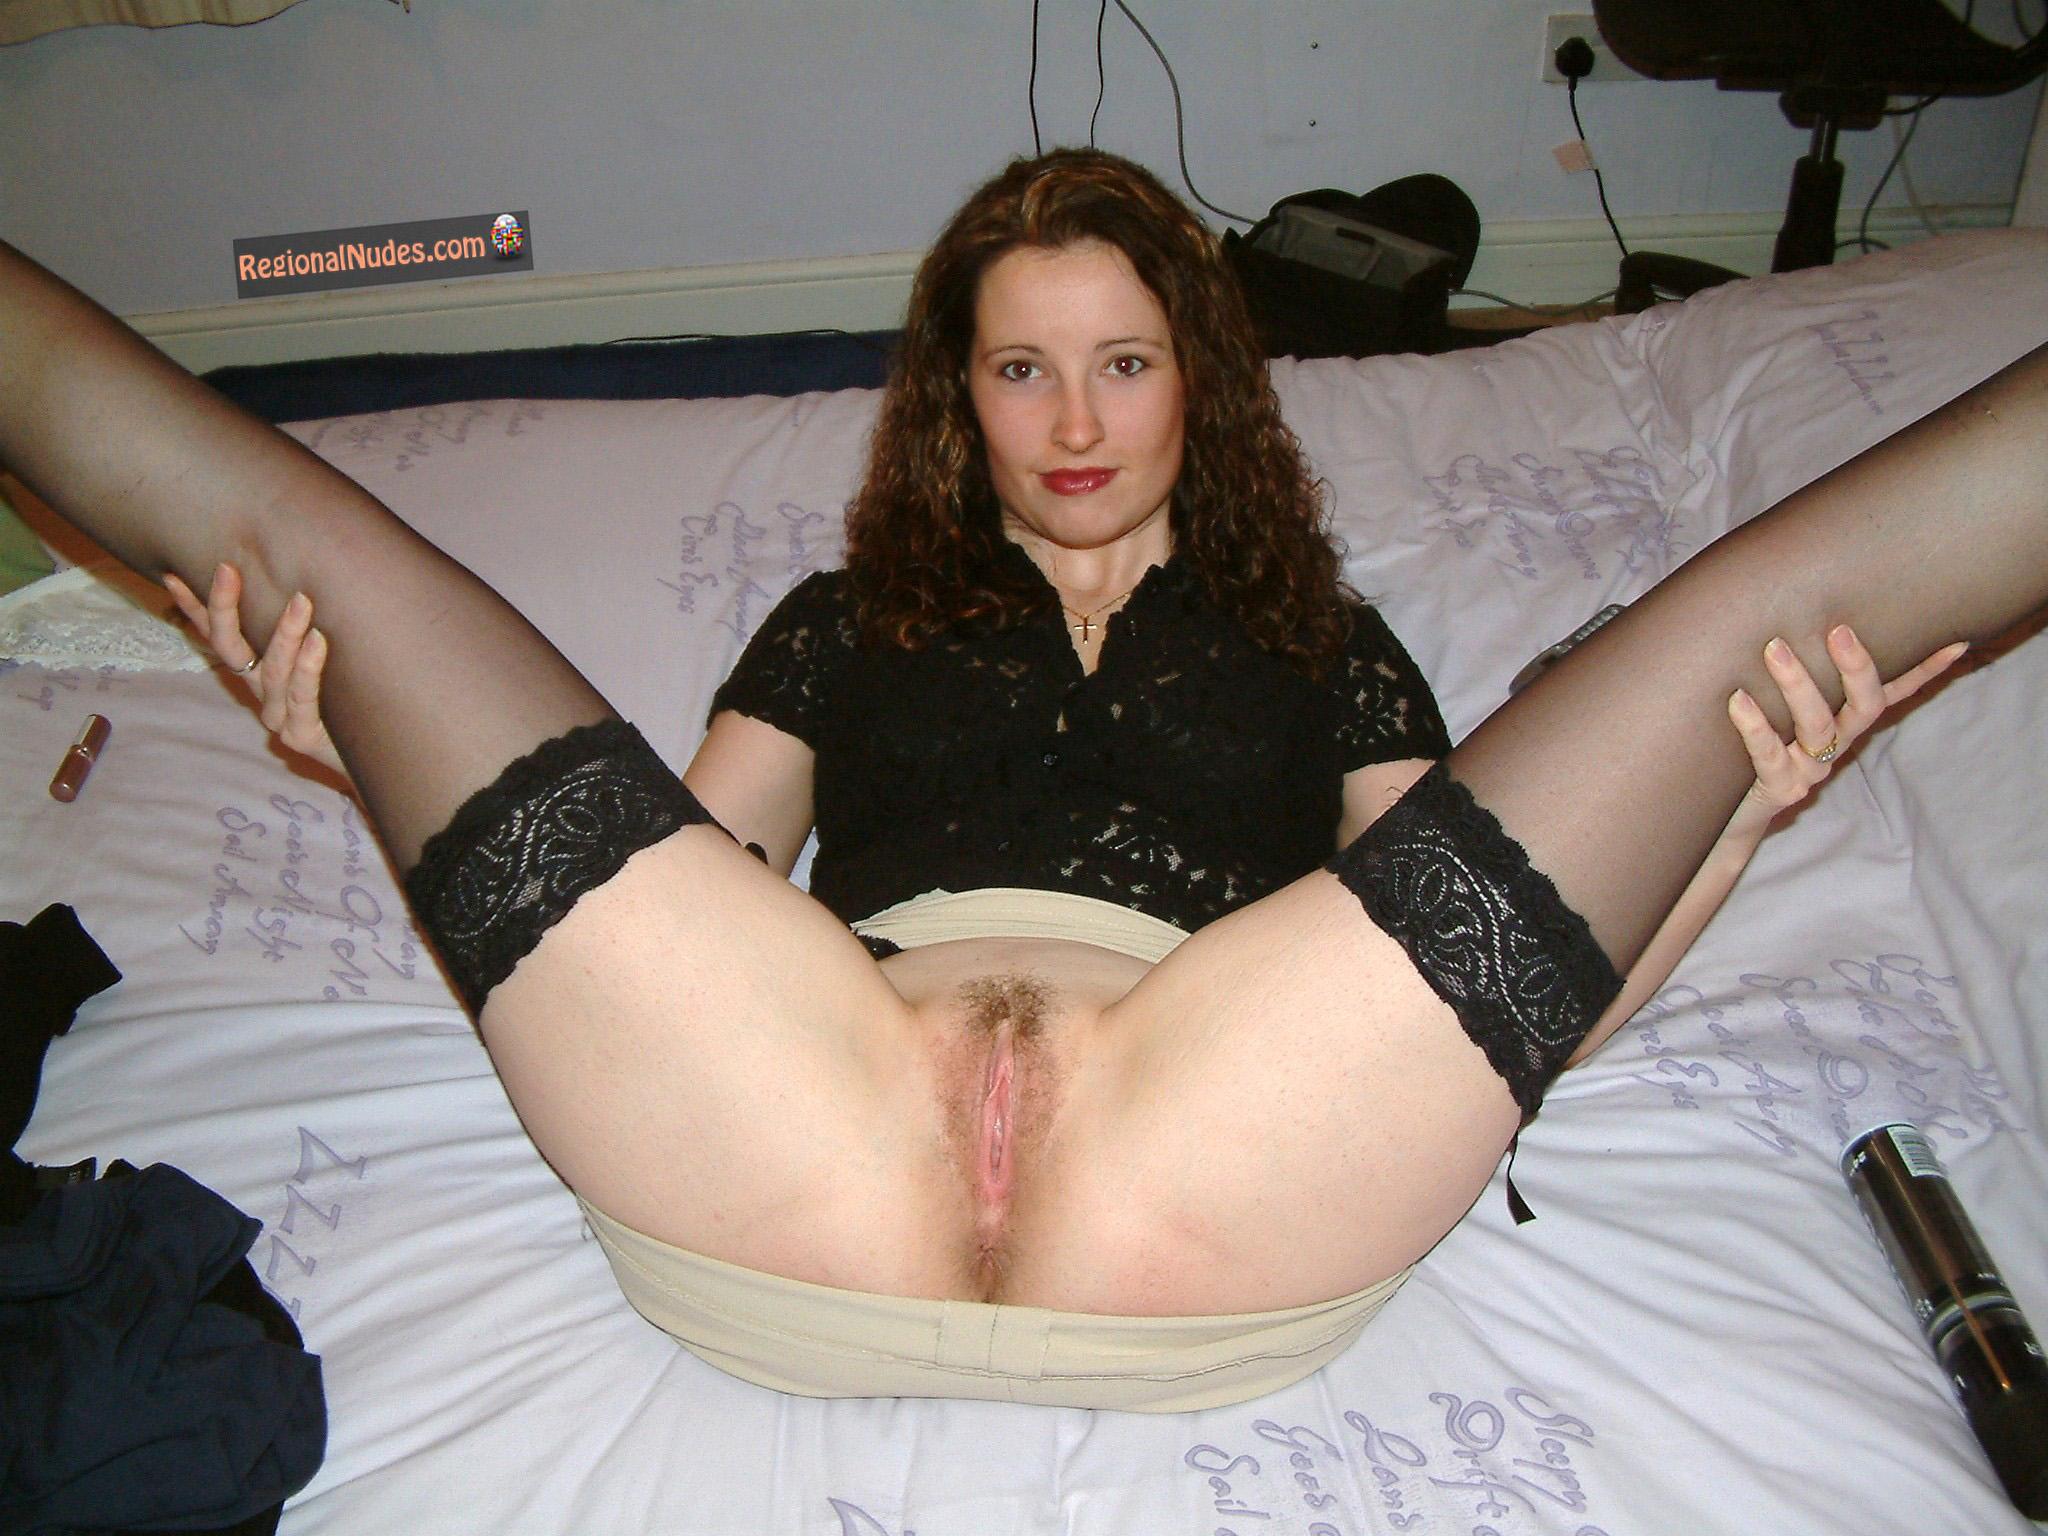 gretchen wilson hottest nude pics